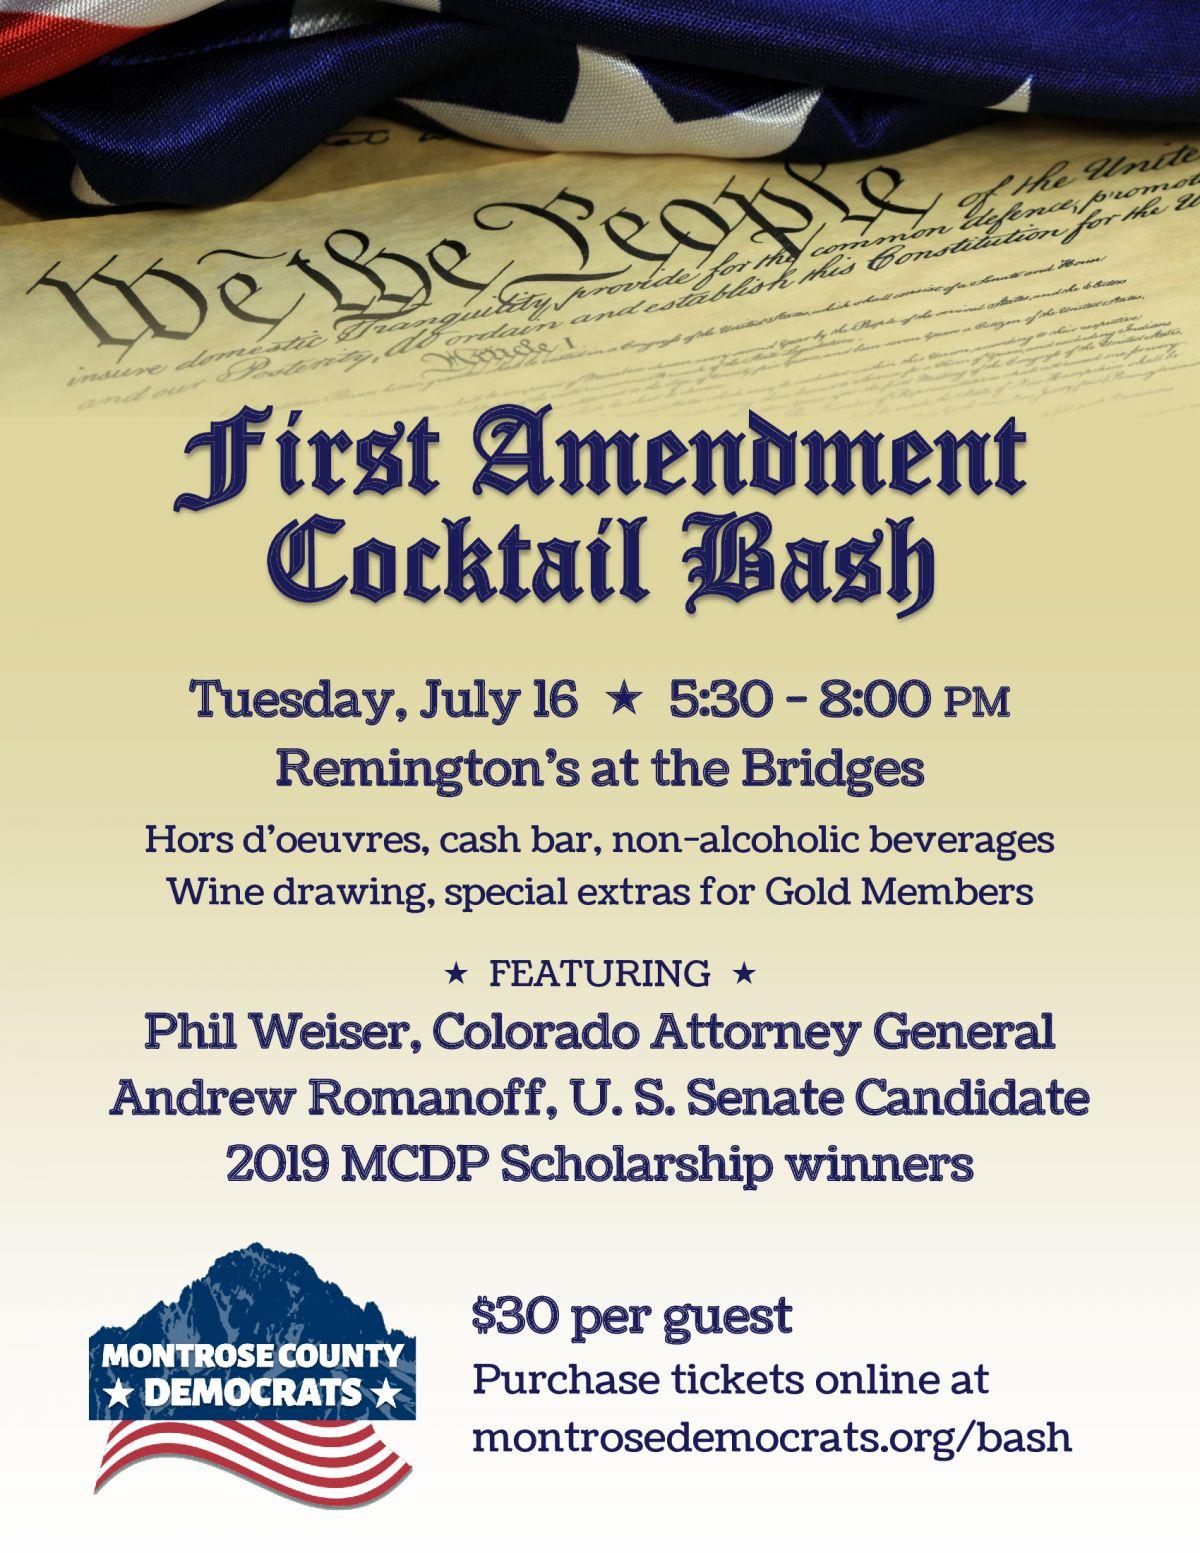 First Amendment Cocktail Bash